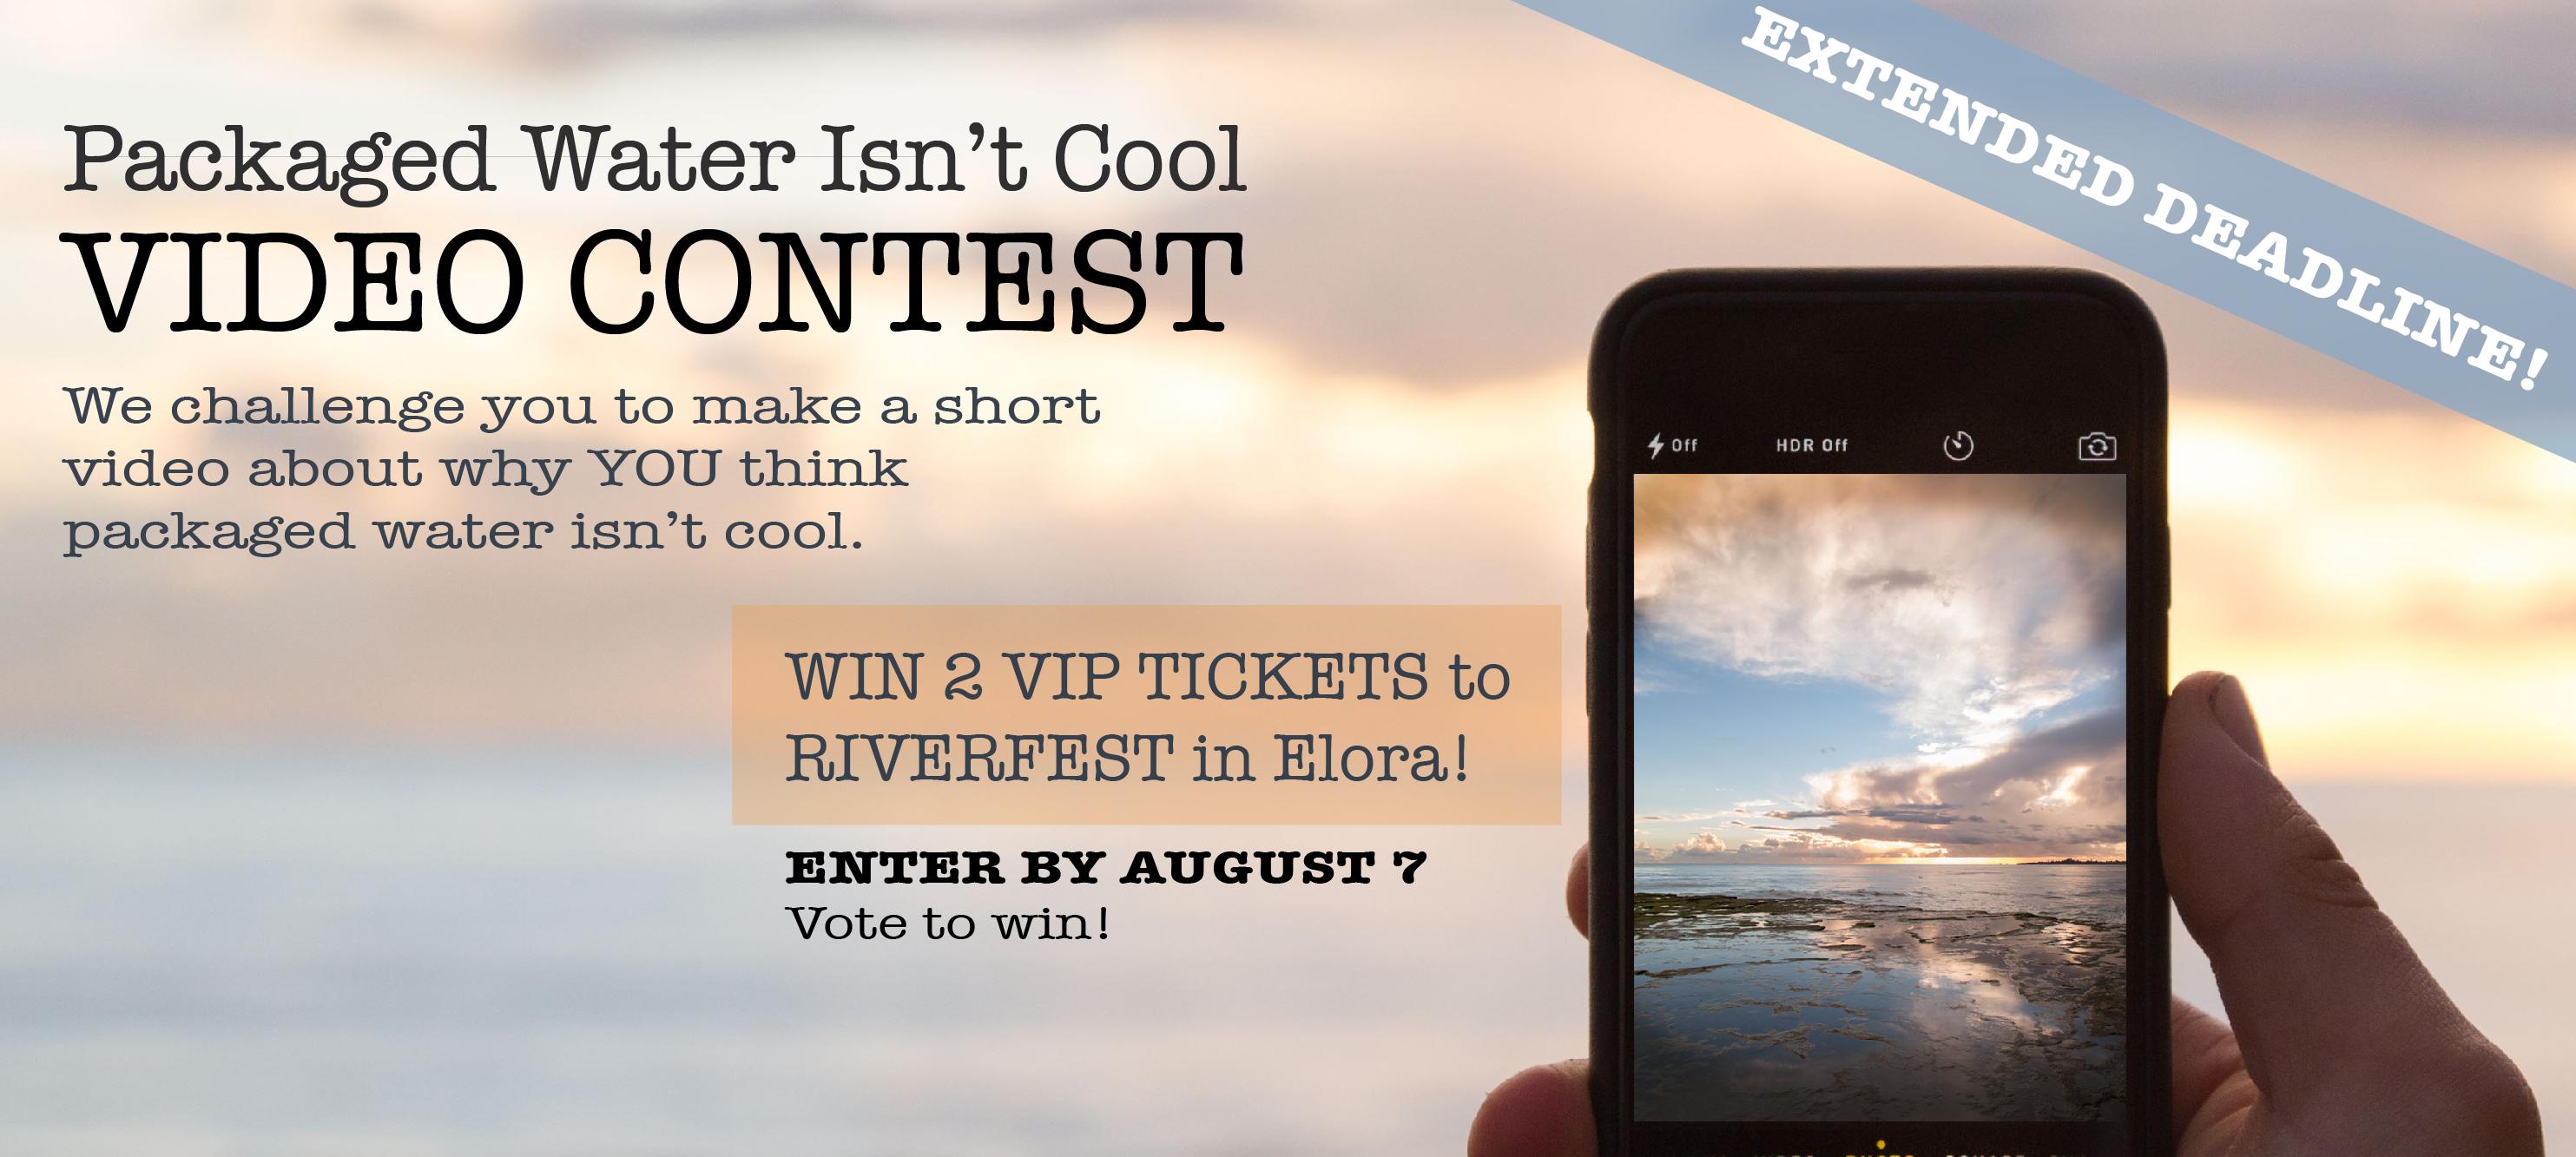 Deadline Extended for Riverfest Video Contest